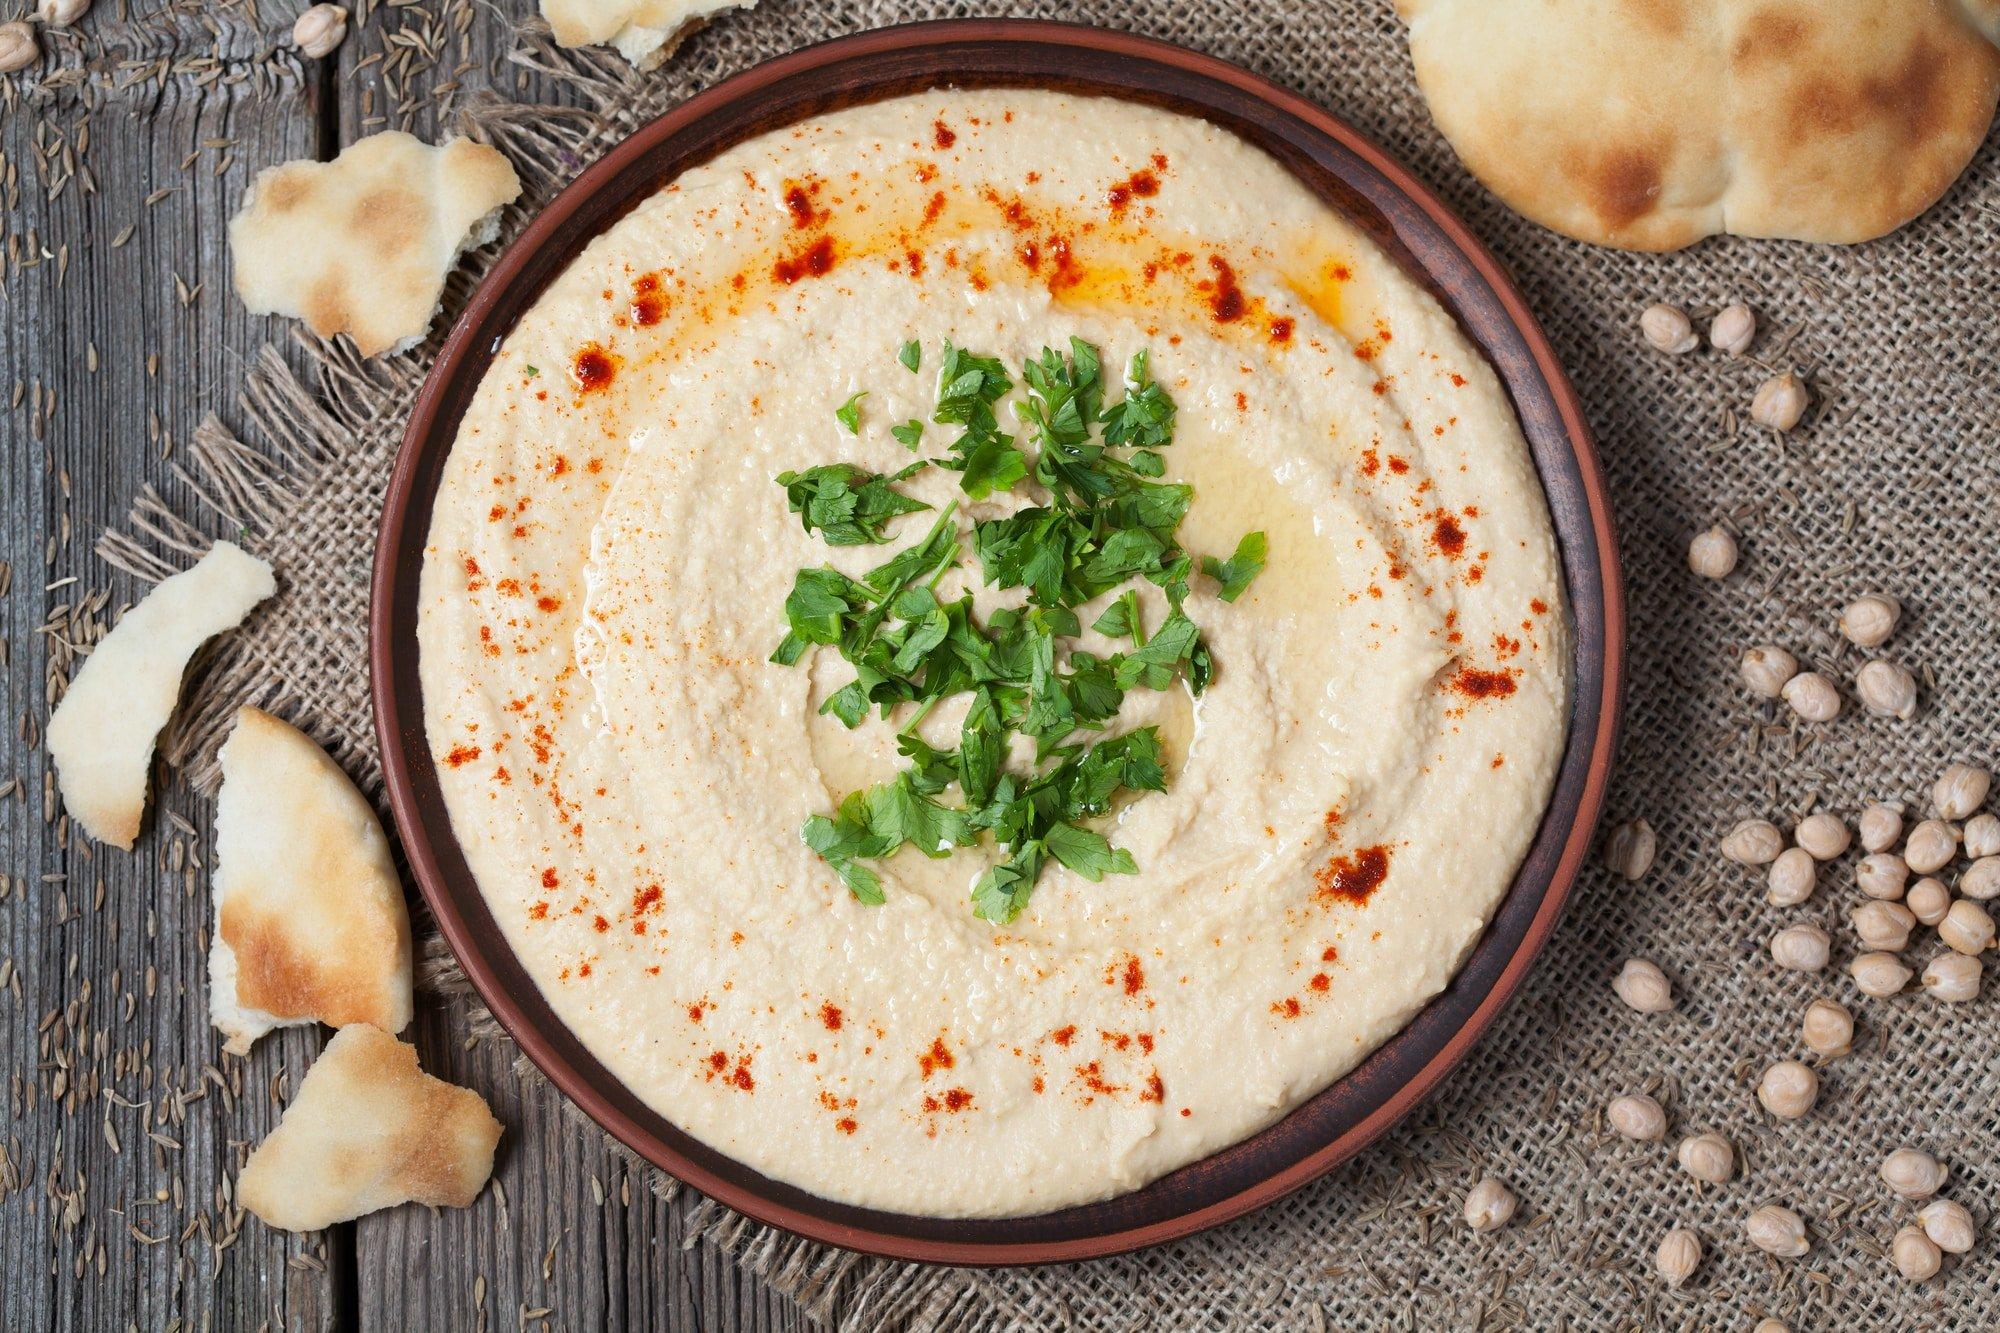 Hummus spices